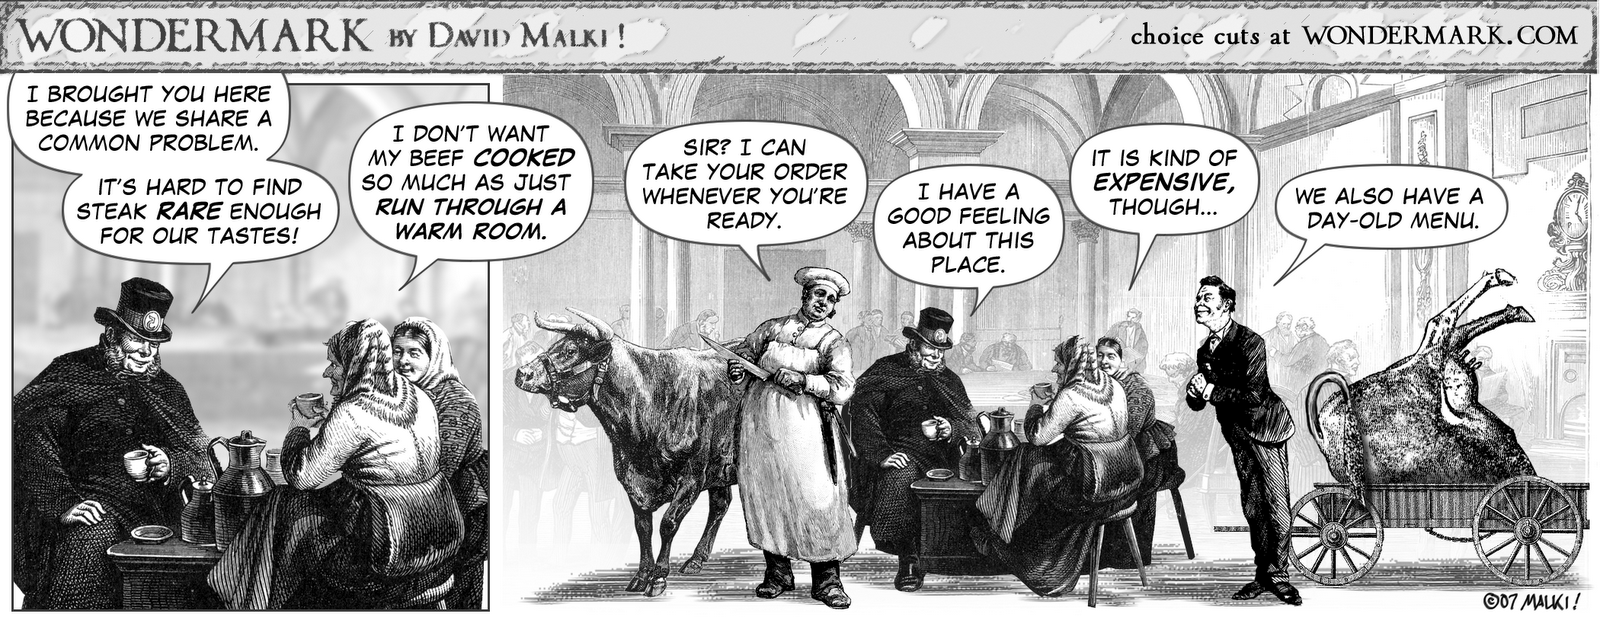 The Sound A Doggy Makes: Dave Malki ! of Wondermark Talks